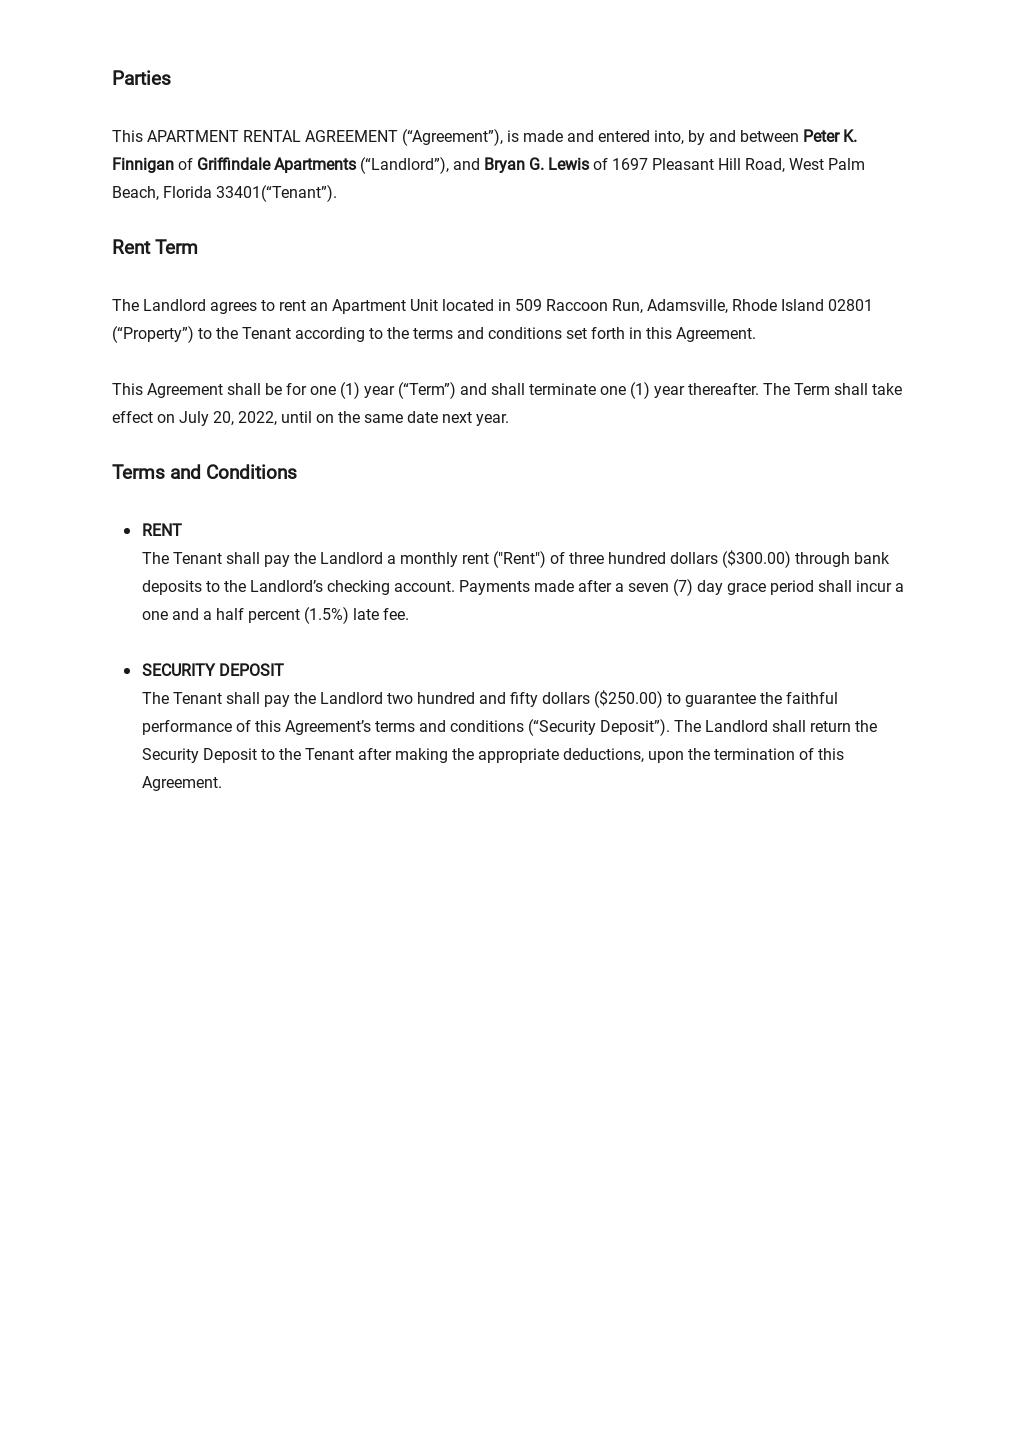 Sample Apartment Rental Agreement Template 1.jpe